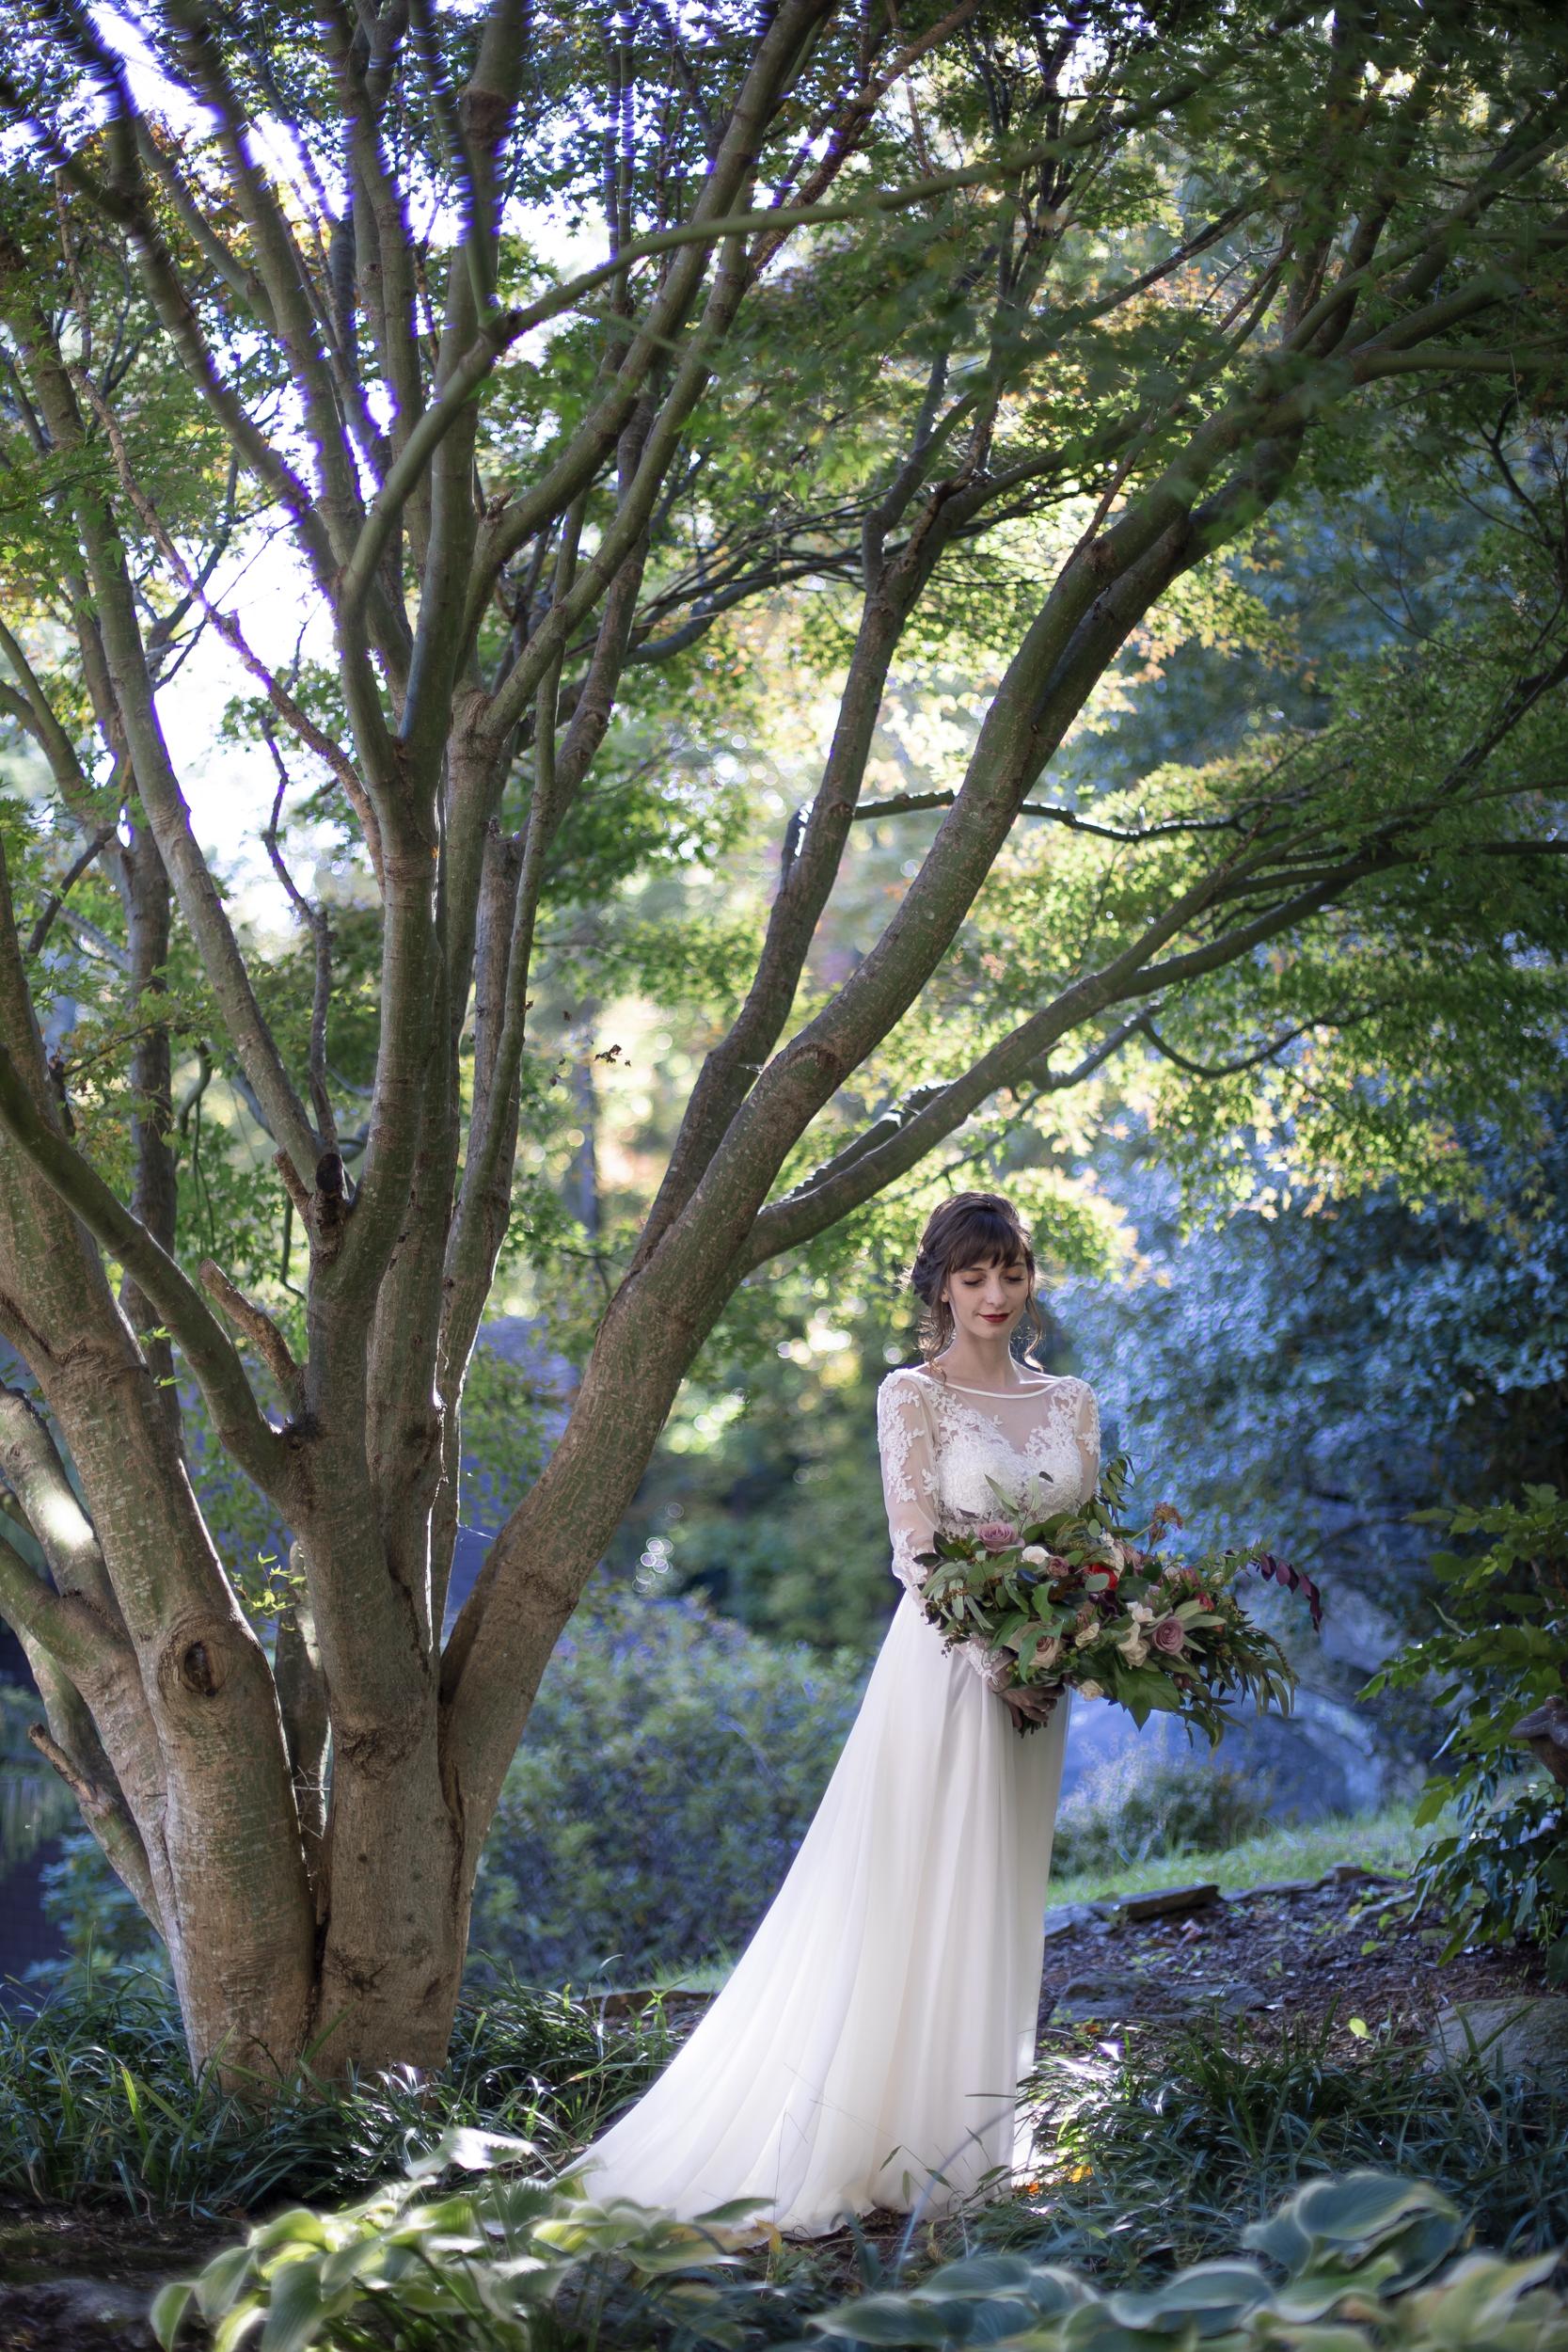 Laurel Falls Wedding October 2018_Allison and Josh__Lola Salon_Flora_Photo by Studio Misha Photography-78.jpg